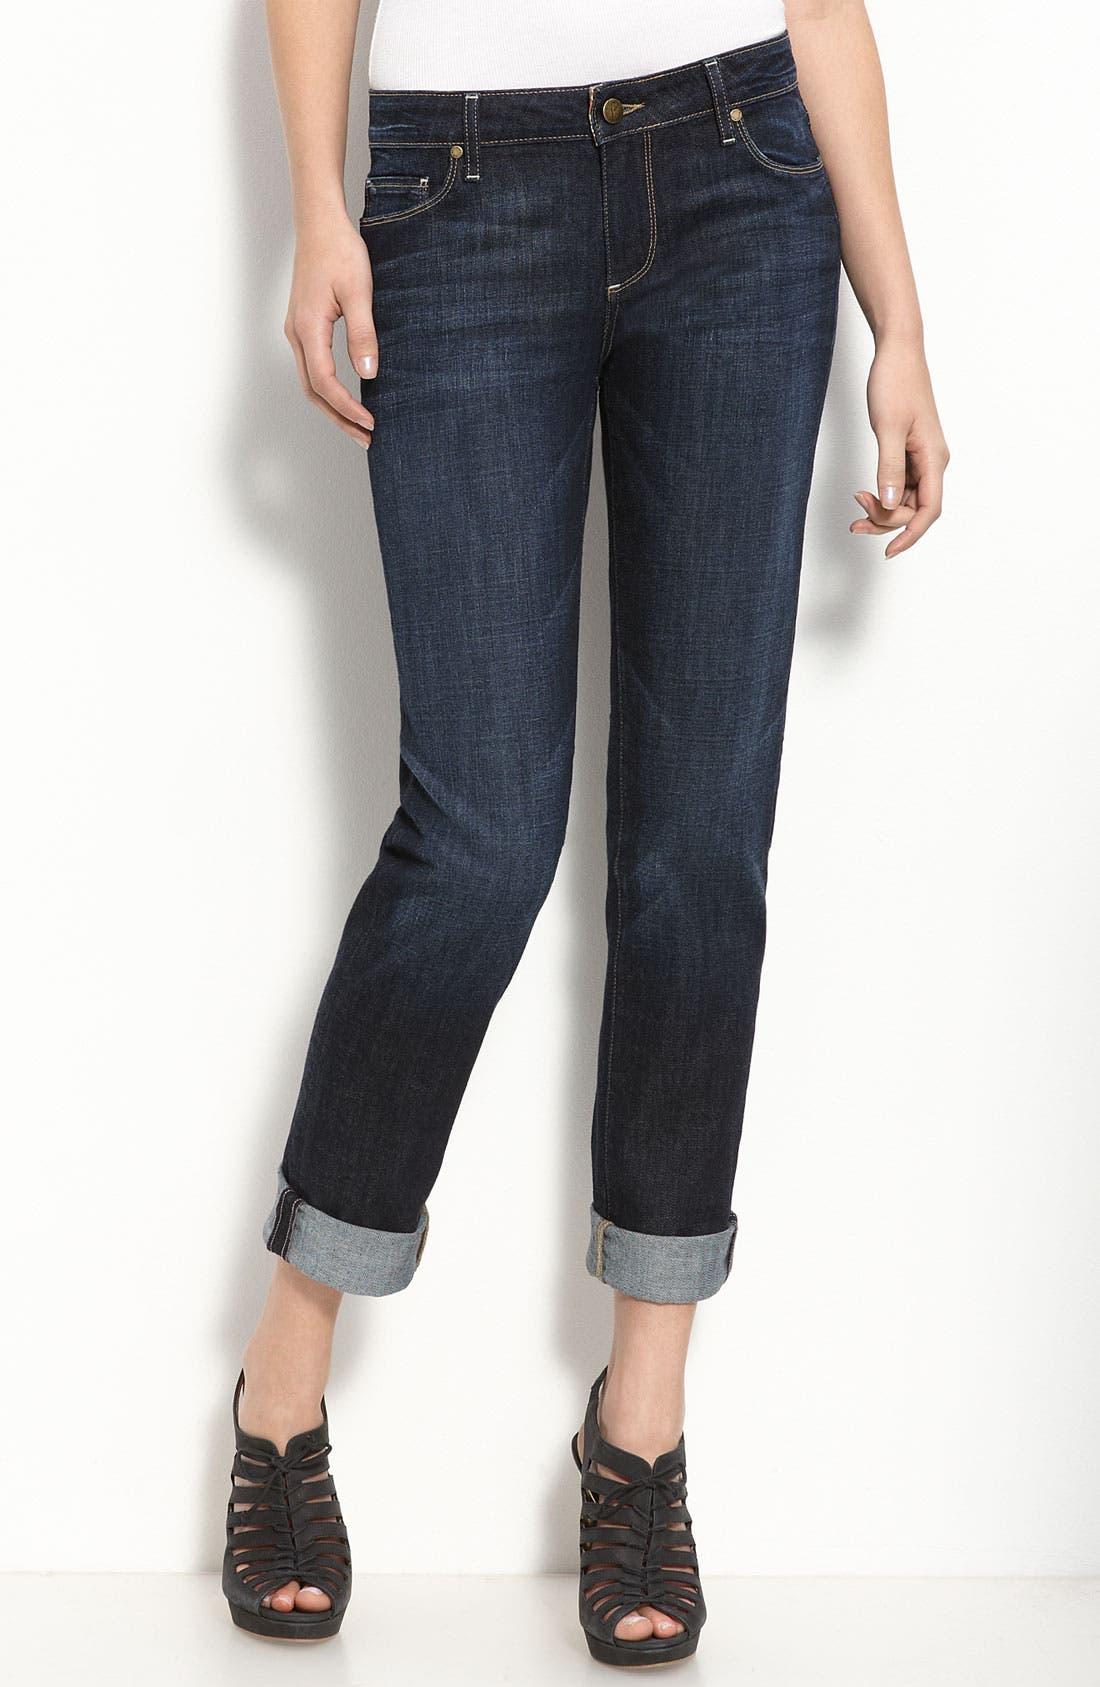 PAIGE, Denim 'Jimmy Jimmy' Stretch Jeans, Main thumbnail 1, color, 410